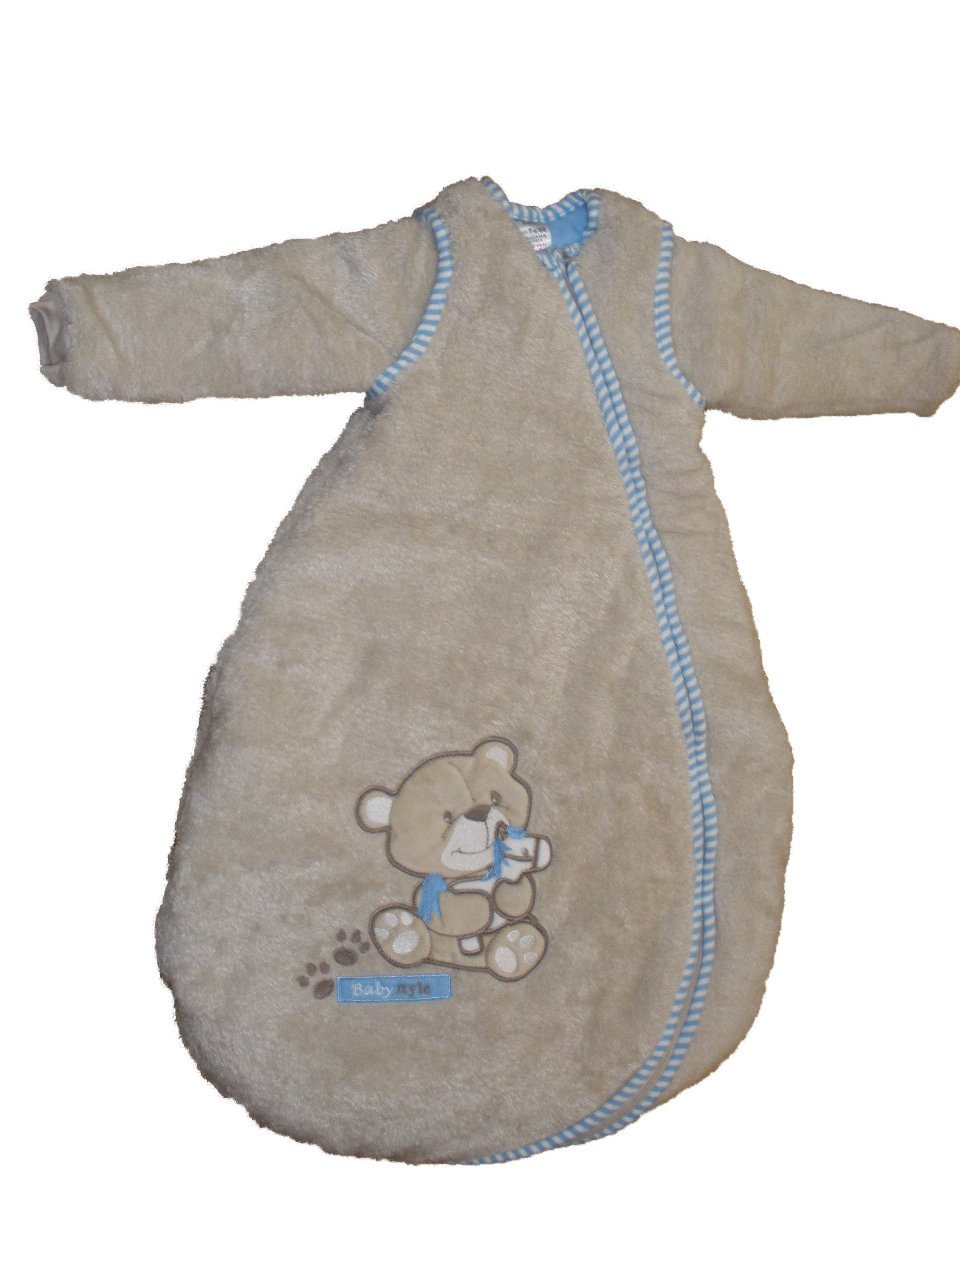 Jacky Baby ragazzo Serie Bear Jeans pagliaccetto Bodies Set sacchi nanna Schlafsack mit abnehmbaren